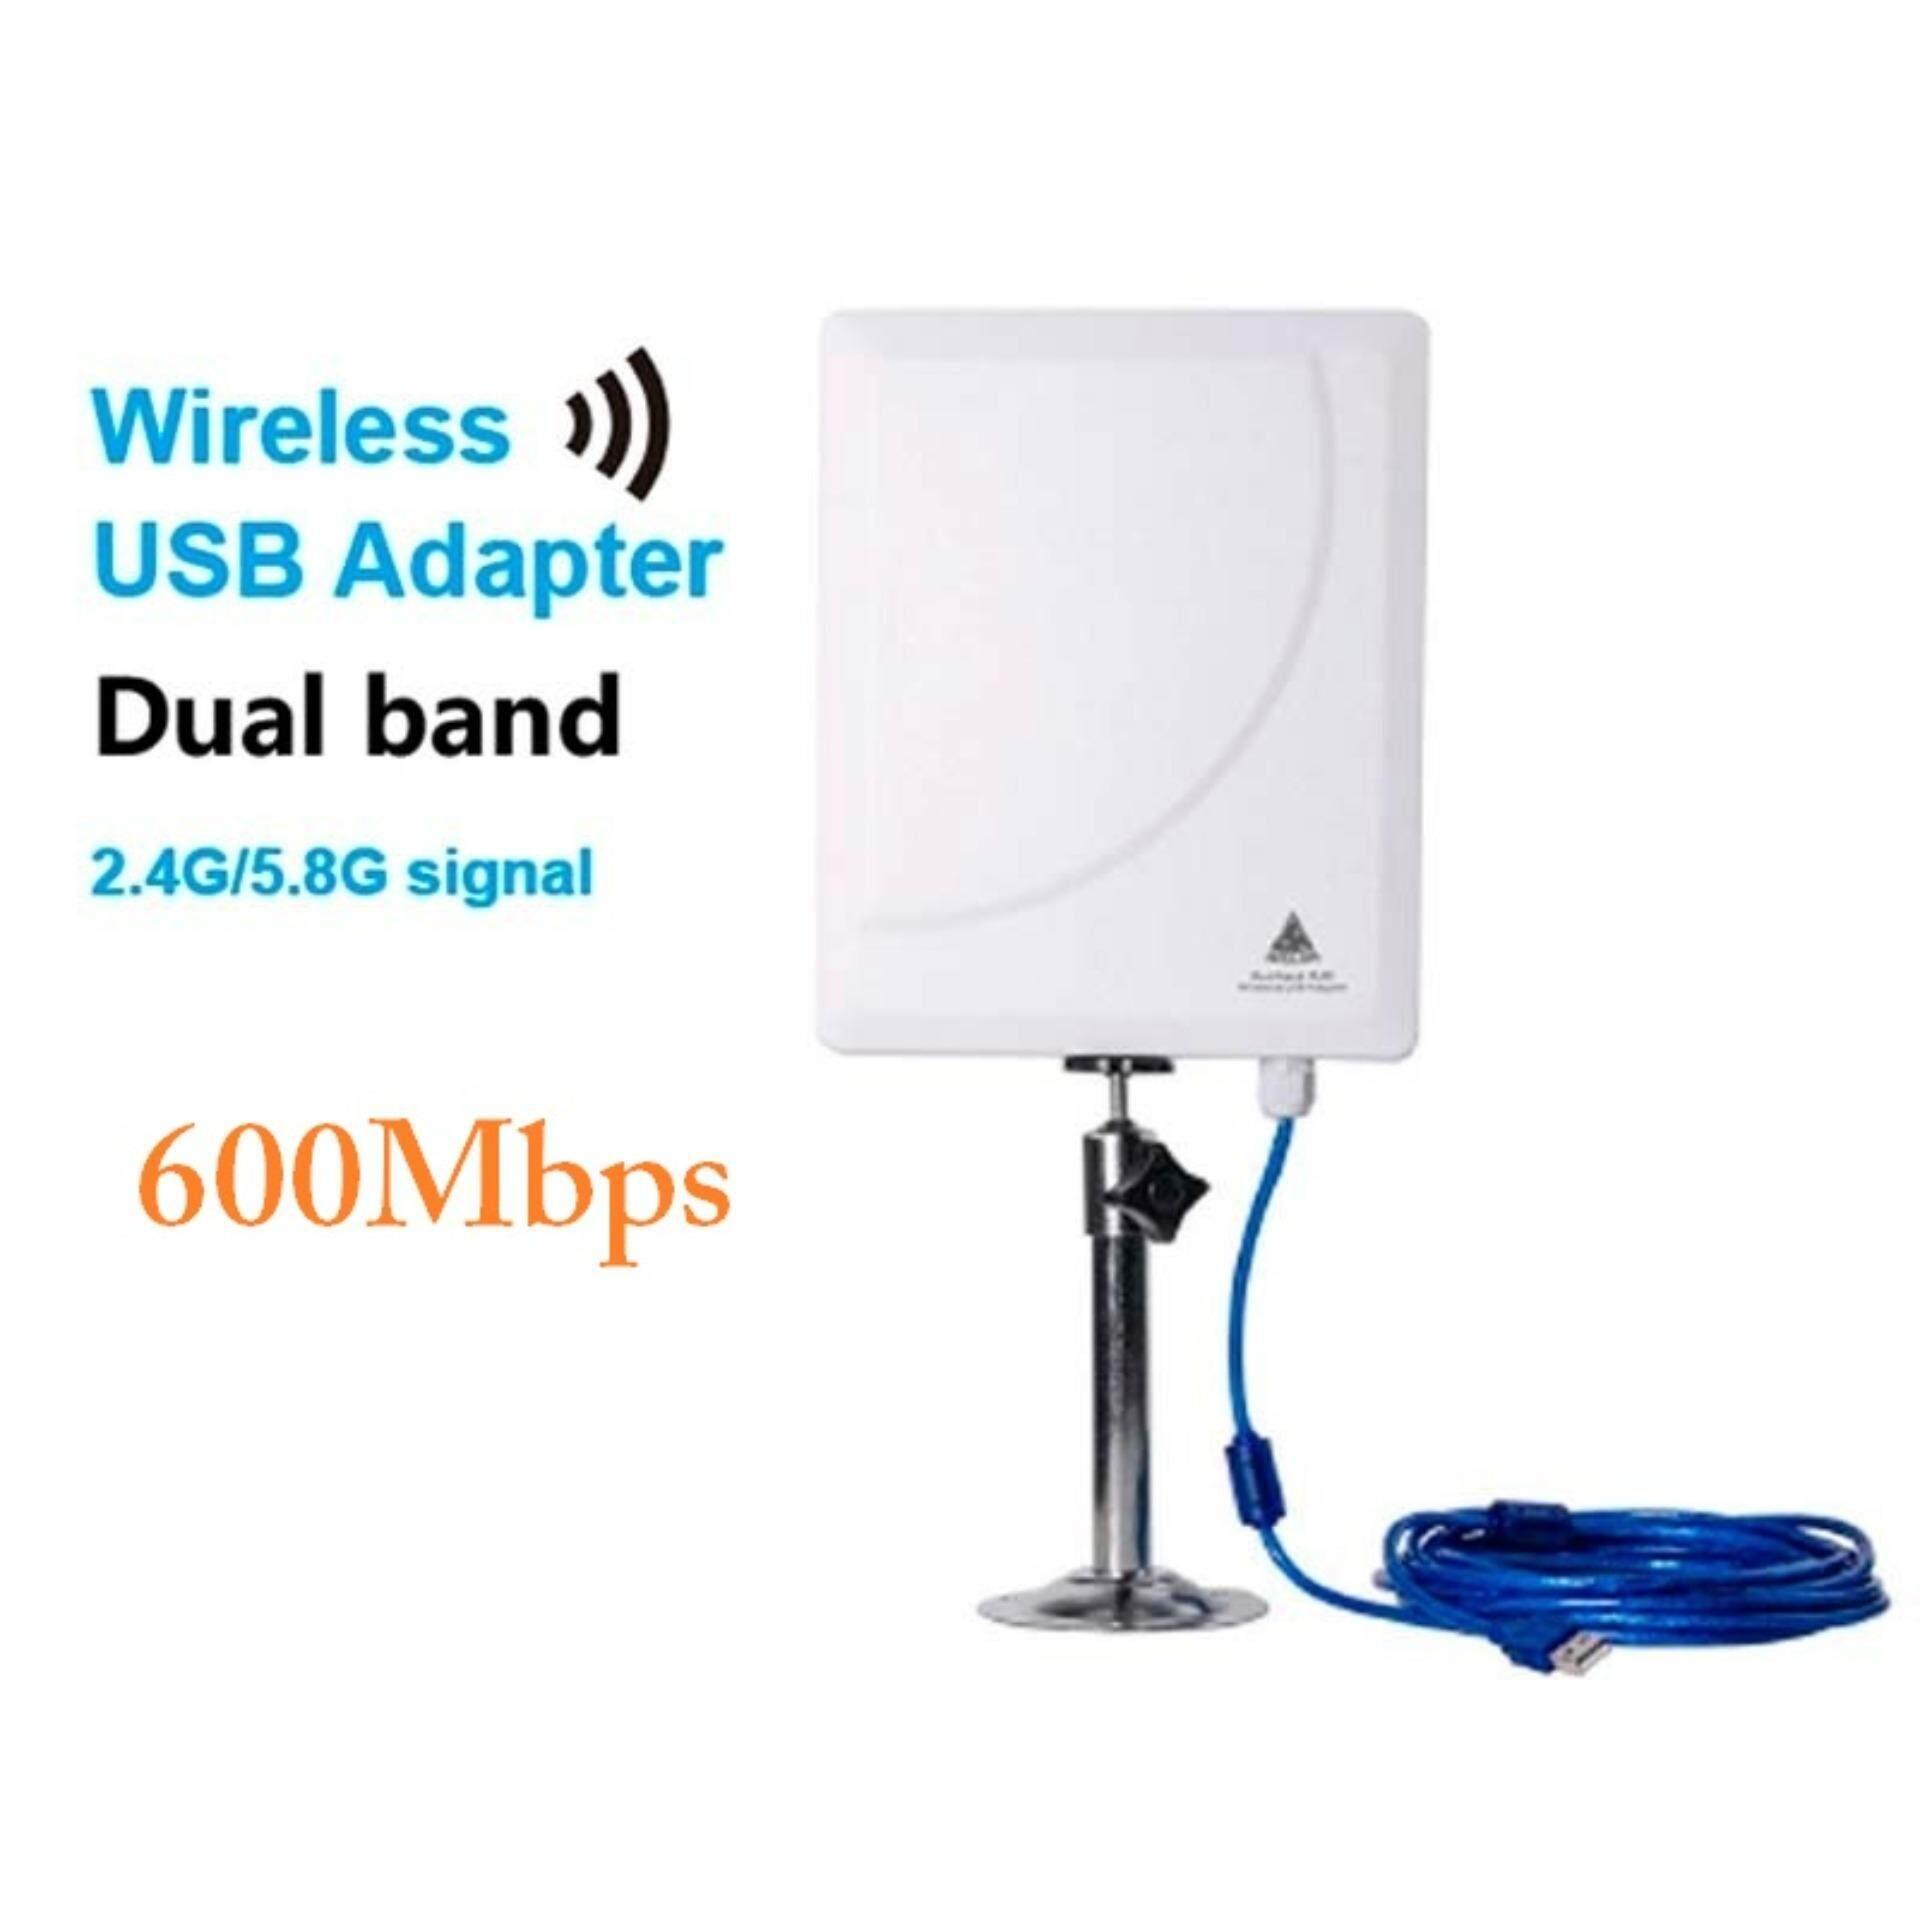 Usb Wifi Adapter 600mbps รองรับ 2.4ghz ,5ghz High Power ตัวรับสัญญาณ Wifi ระยะไกล สัญญาณแรงสุดๆ (n519d).